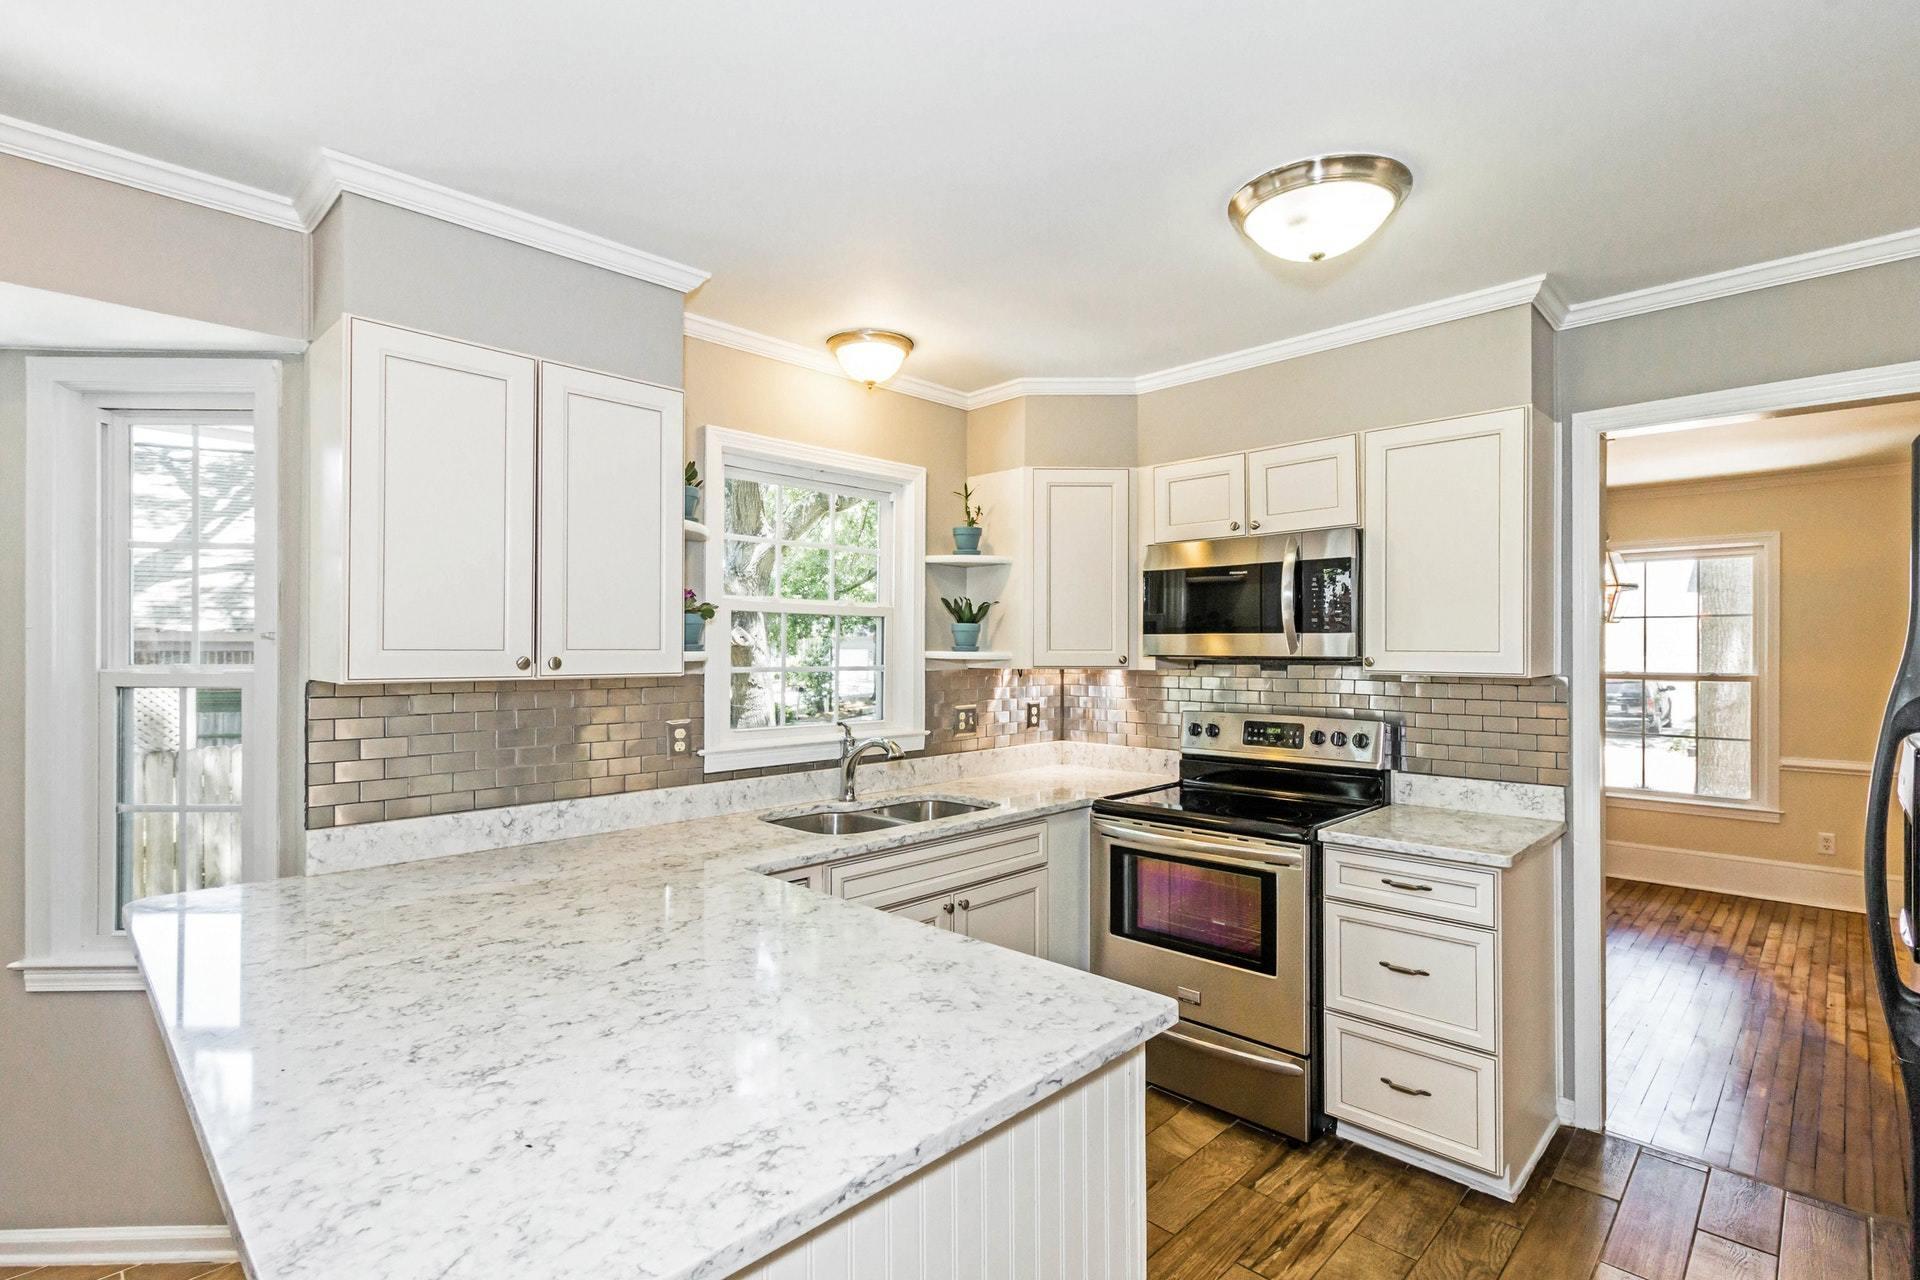 Shemwood II Homes For Sale - 969 Sea Gull, Mount Pleasant, SC - 22